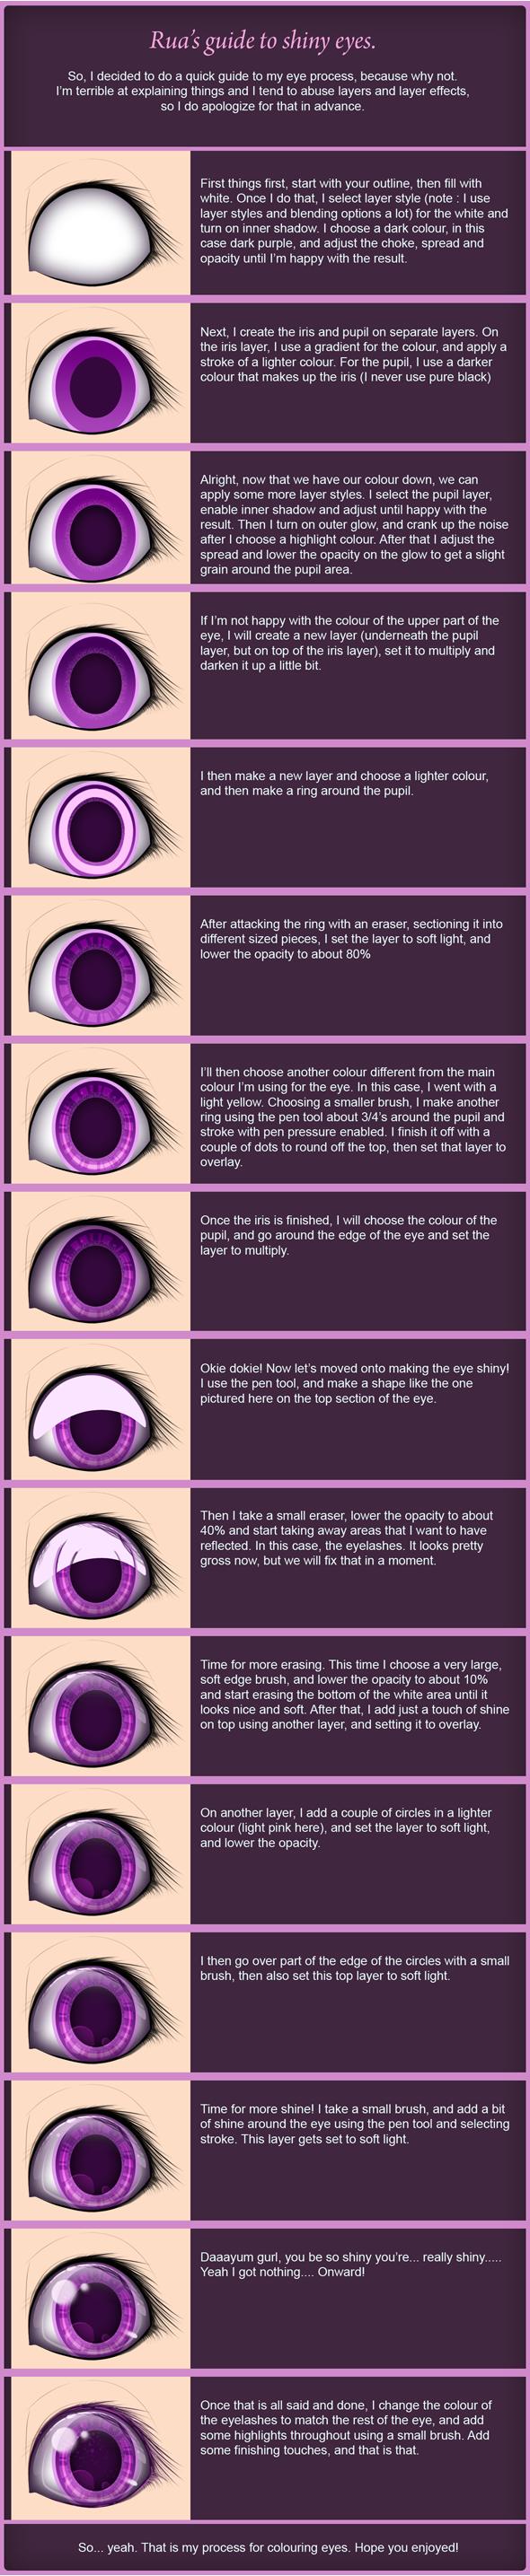 Rua's guide to shiny eyes by Ruaniamh